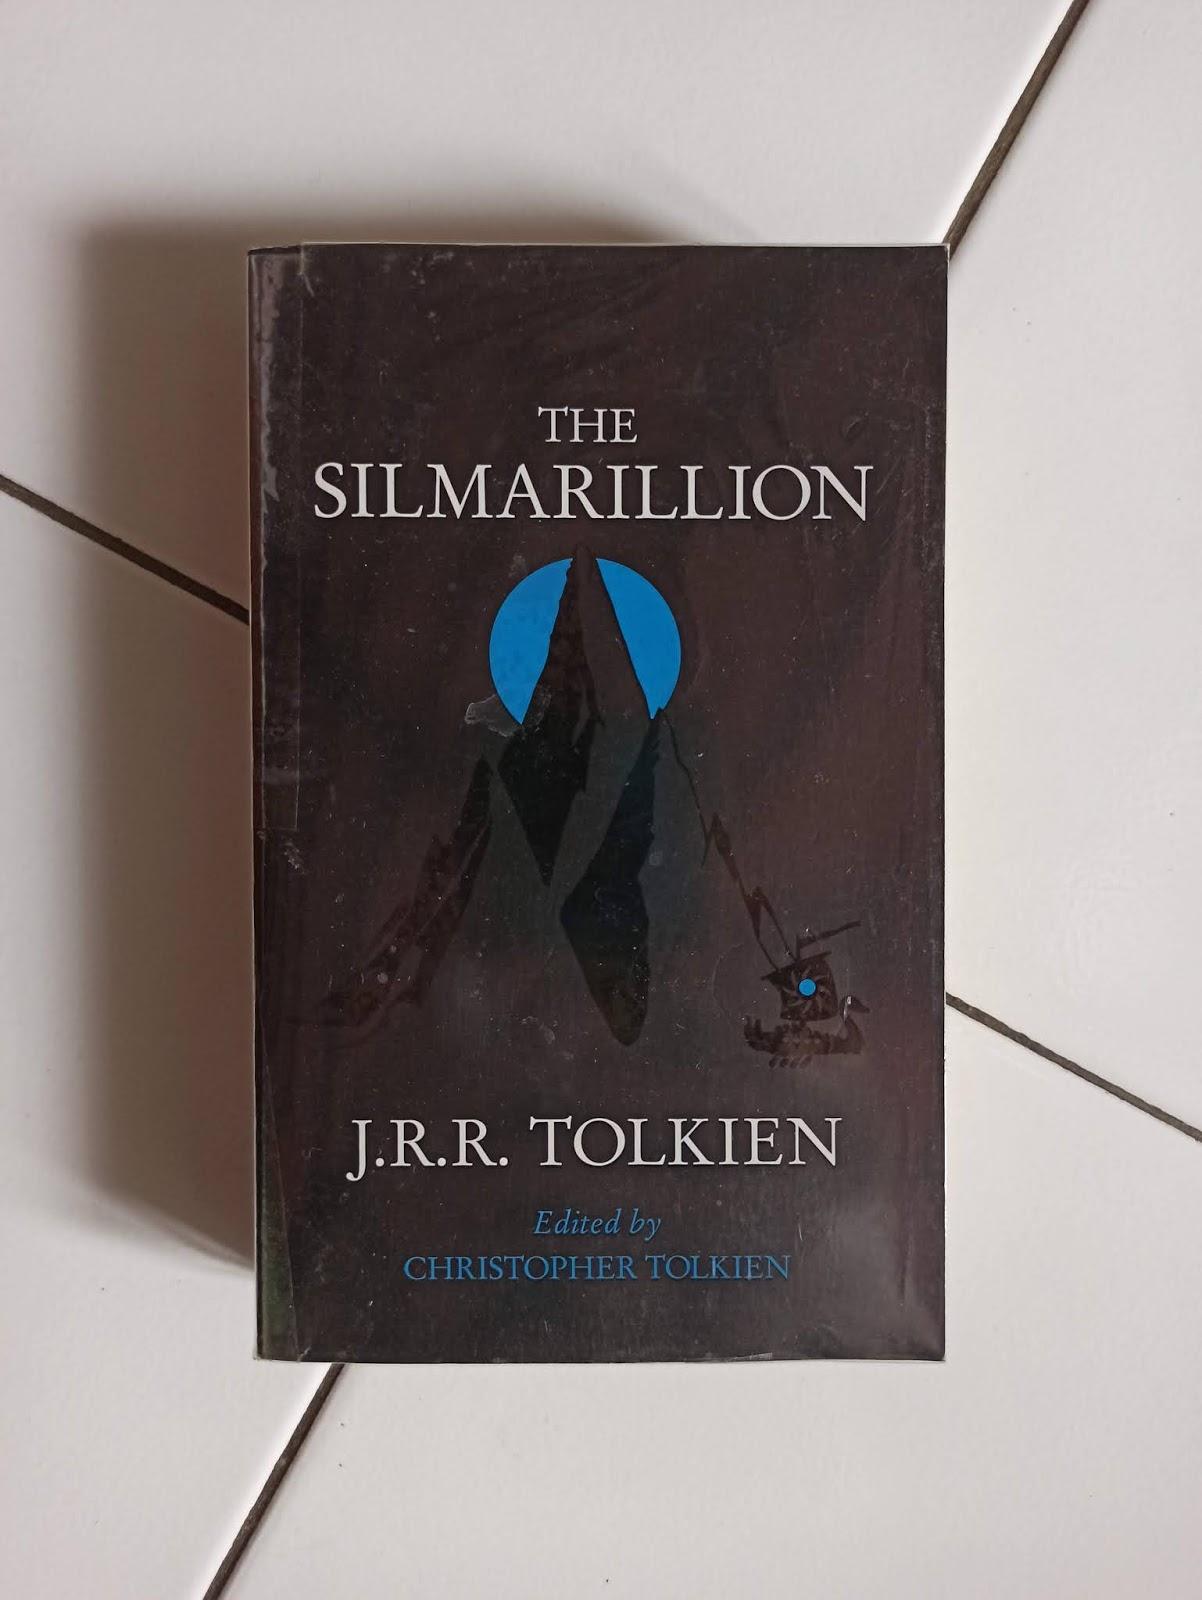 Preloved The Silmarillion A Novel by J.R.R. Tolkien